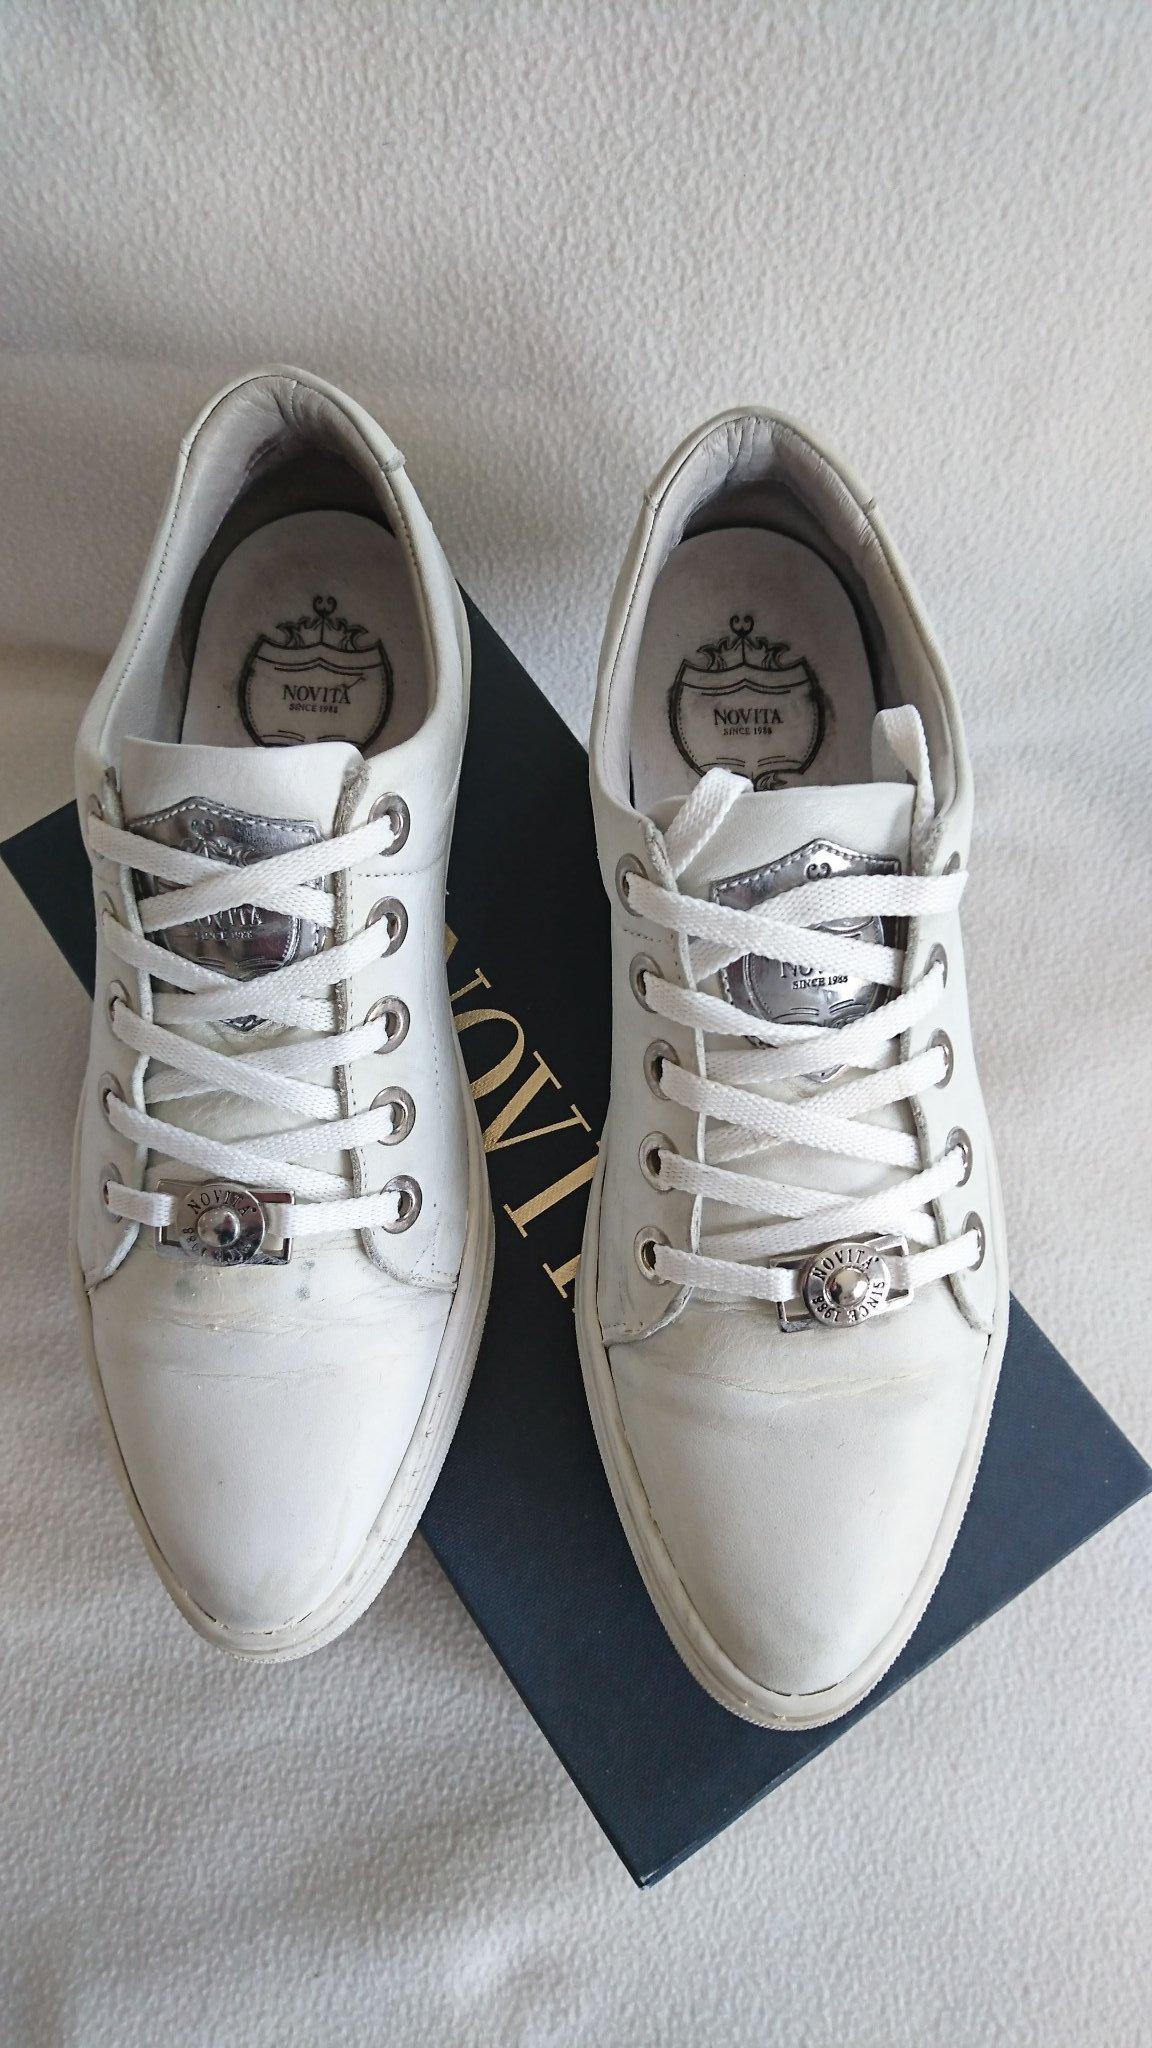 77bac86f8e3 Vita sneakers från Novita Scorett i storlek 39 .. (349811061) ᐈ Köp ...